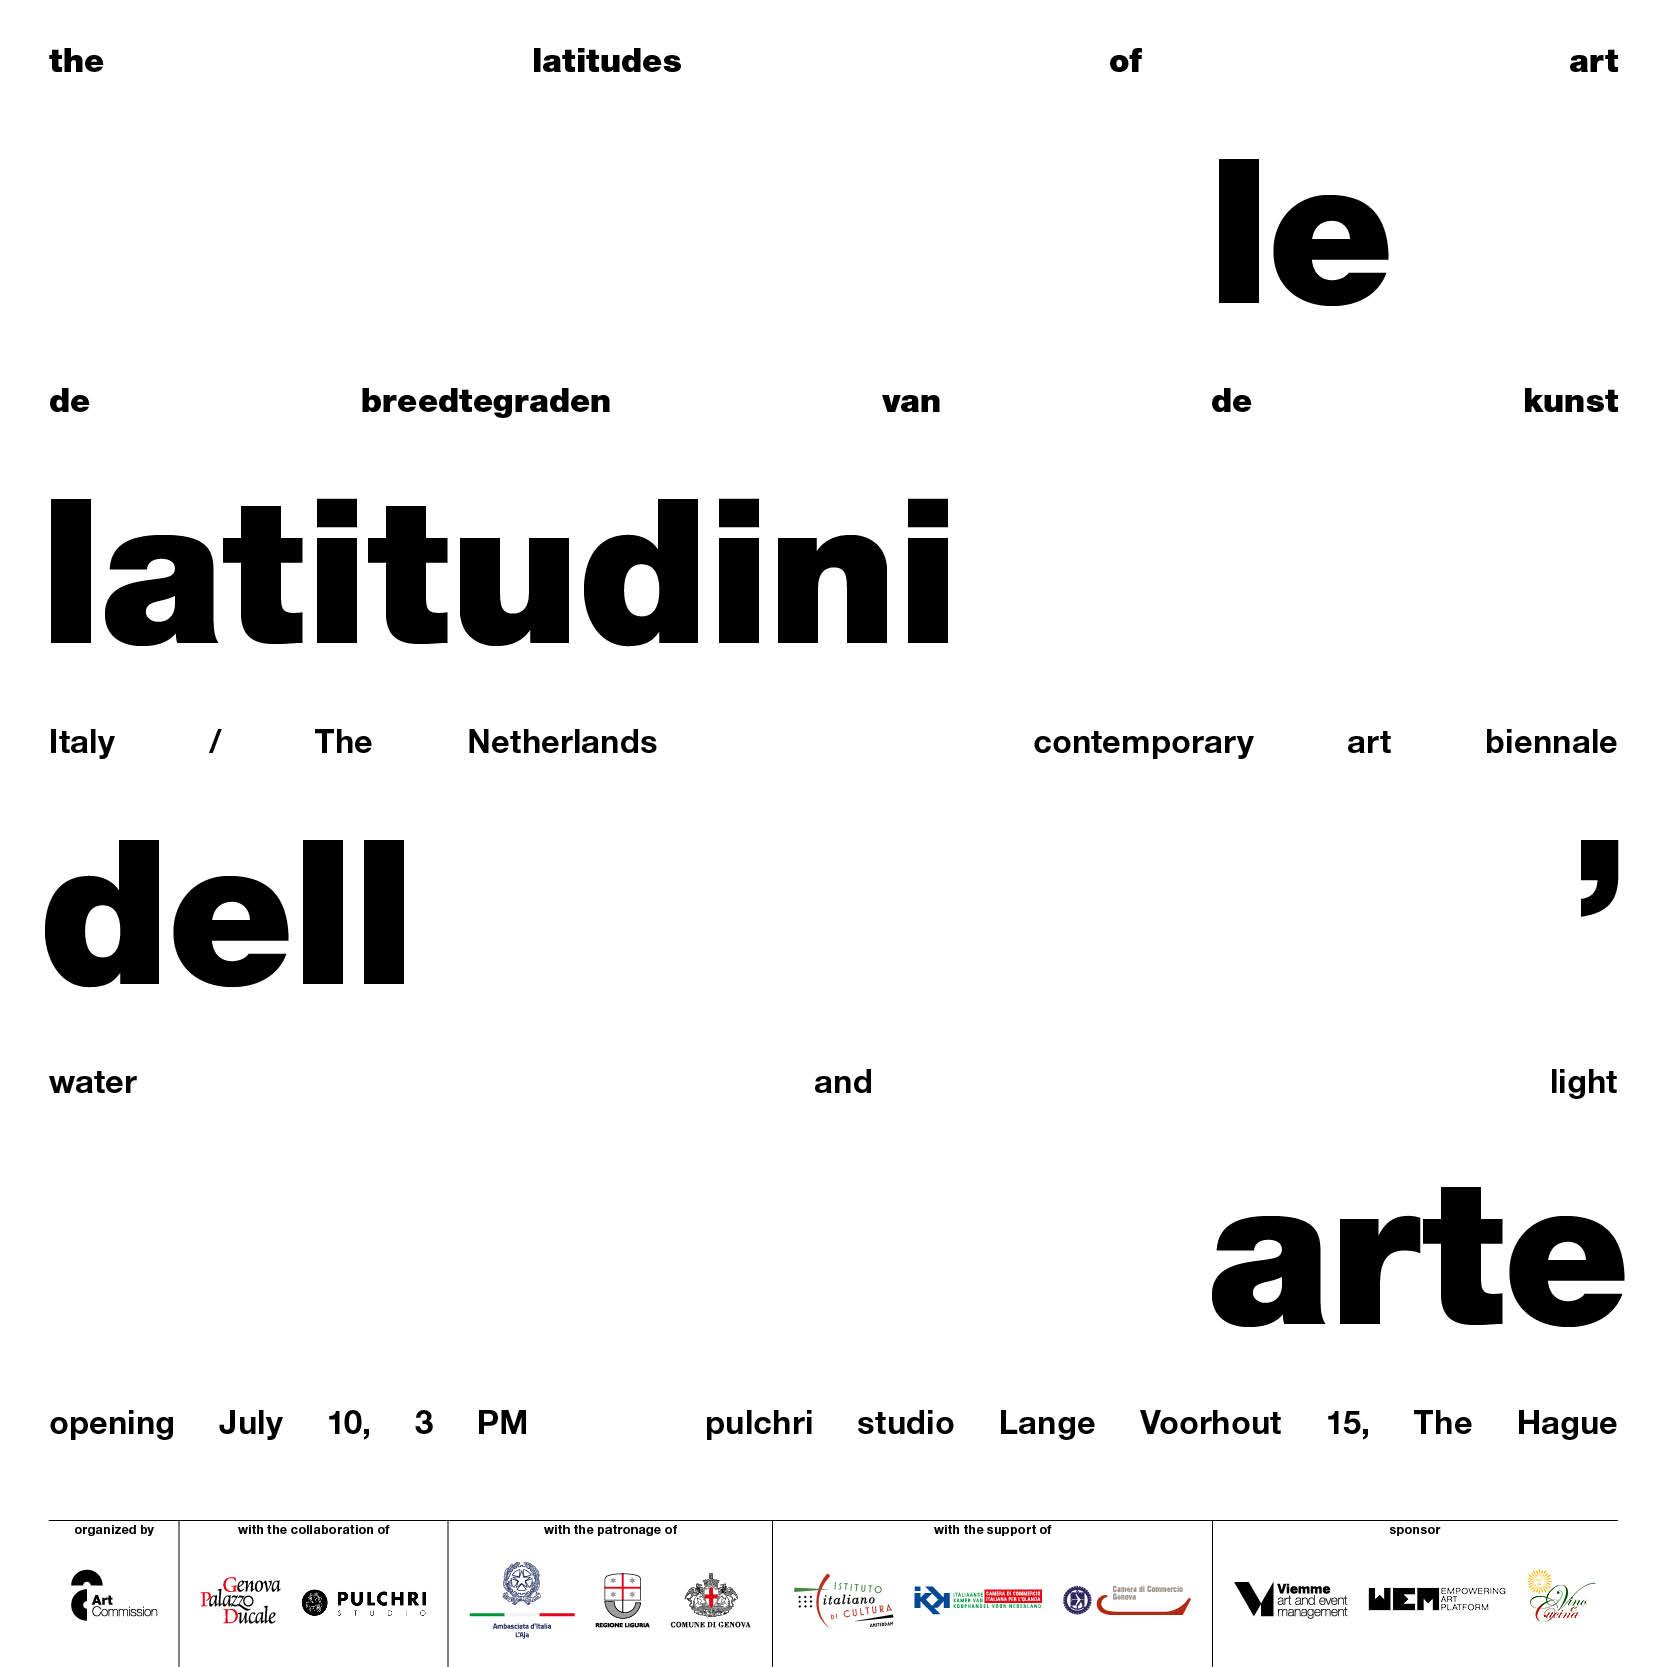 Latitudini Arte Den Haag 07.10.2021 Italia Olanda